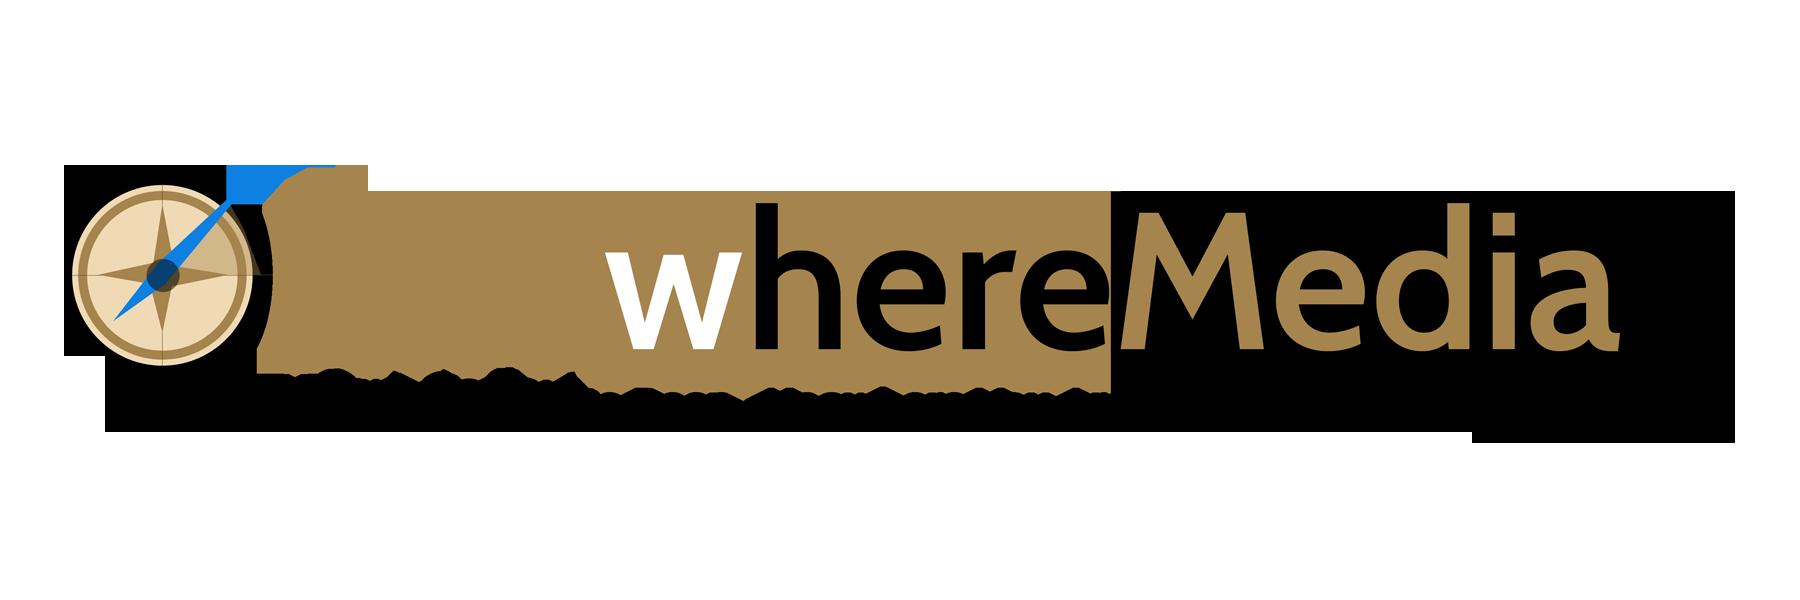 Knowhere Media Slider Logo with Tagline